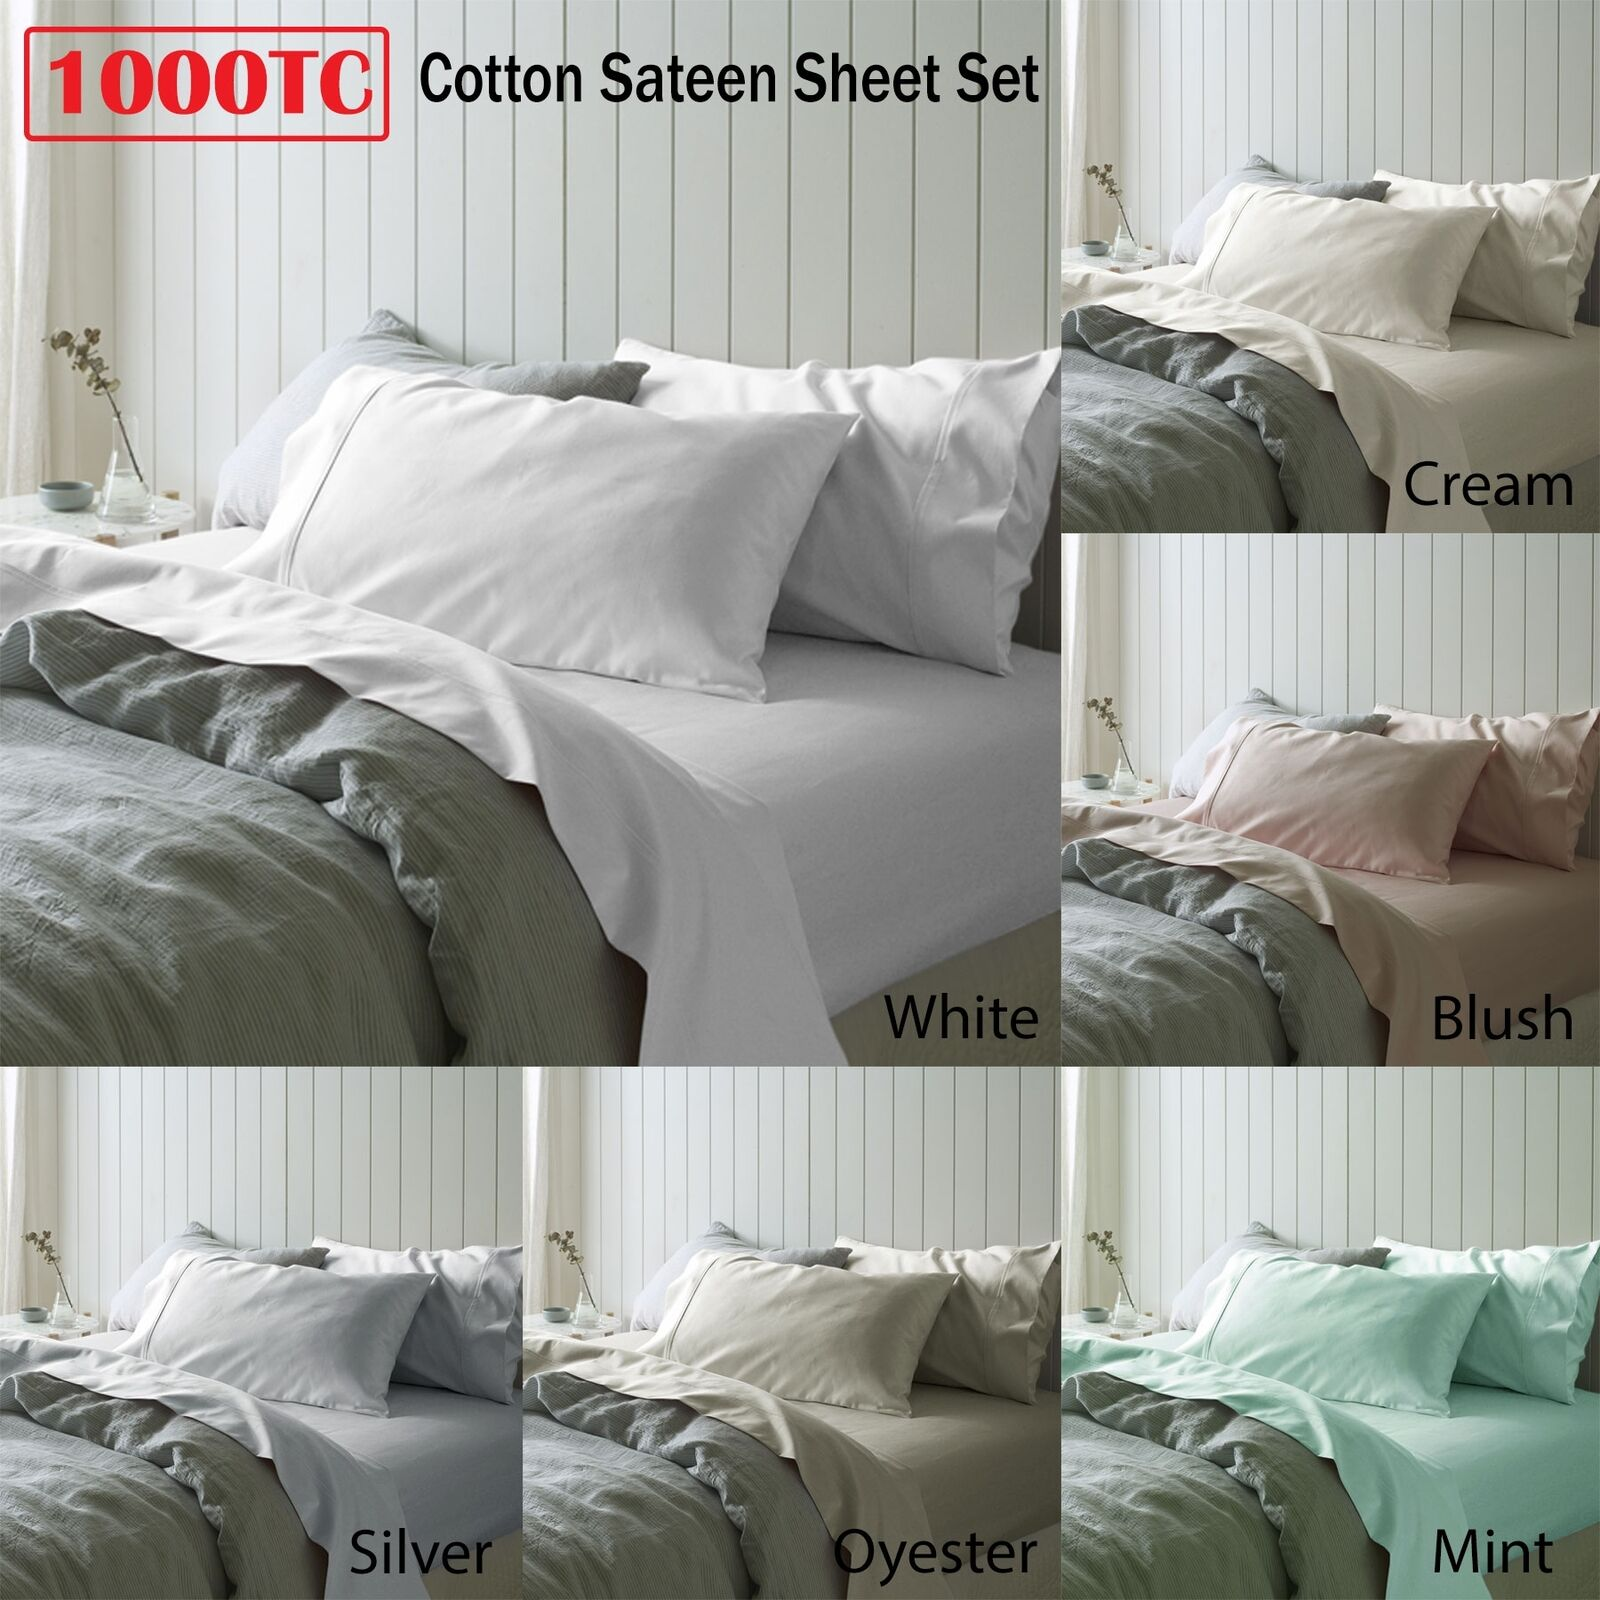 1000TC Cotton Sateen Sheet Set - SINGLE DOUBLE QUEEN KING Super King